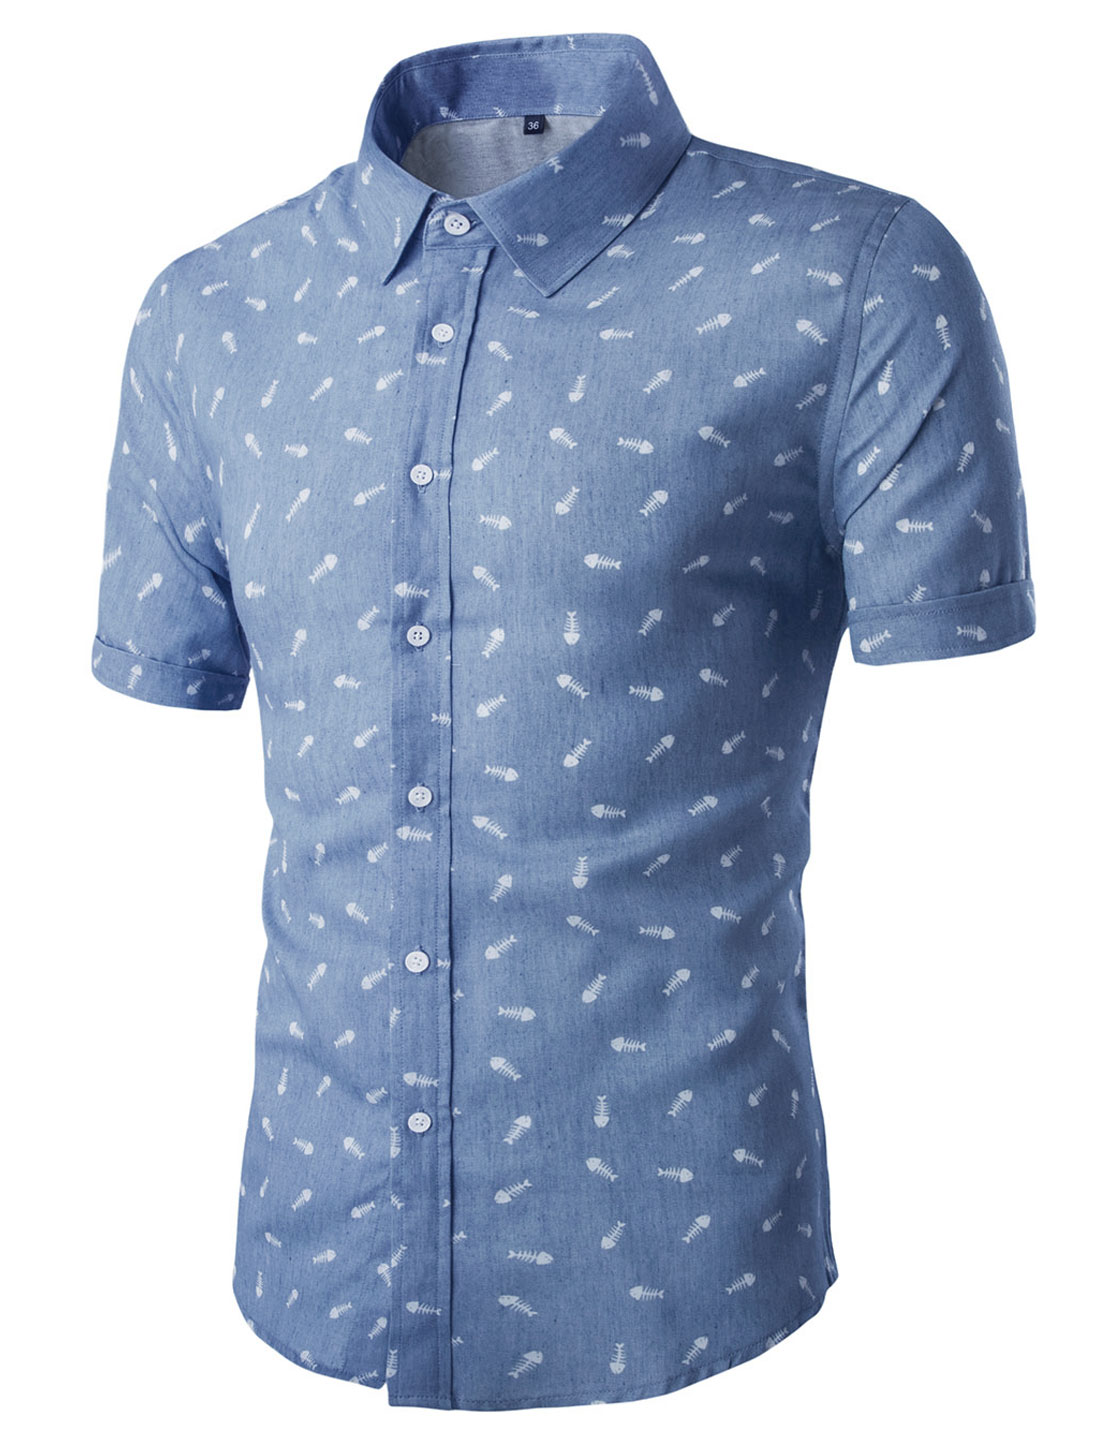 Men Point Collar Button Up Fishbone Prints Cotton Shirt Blue M